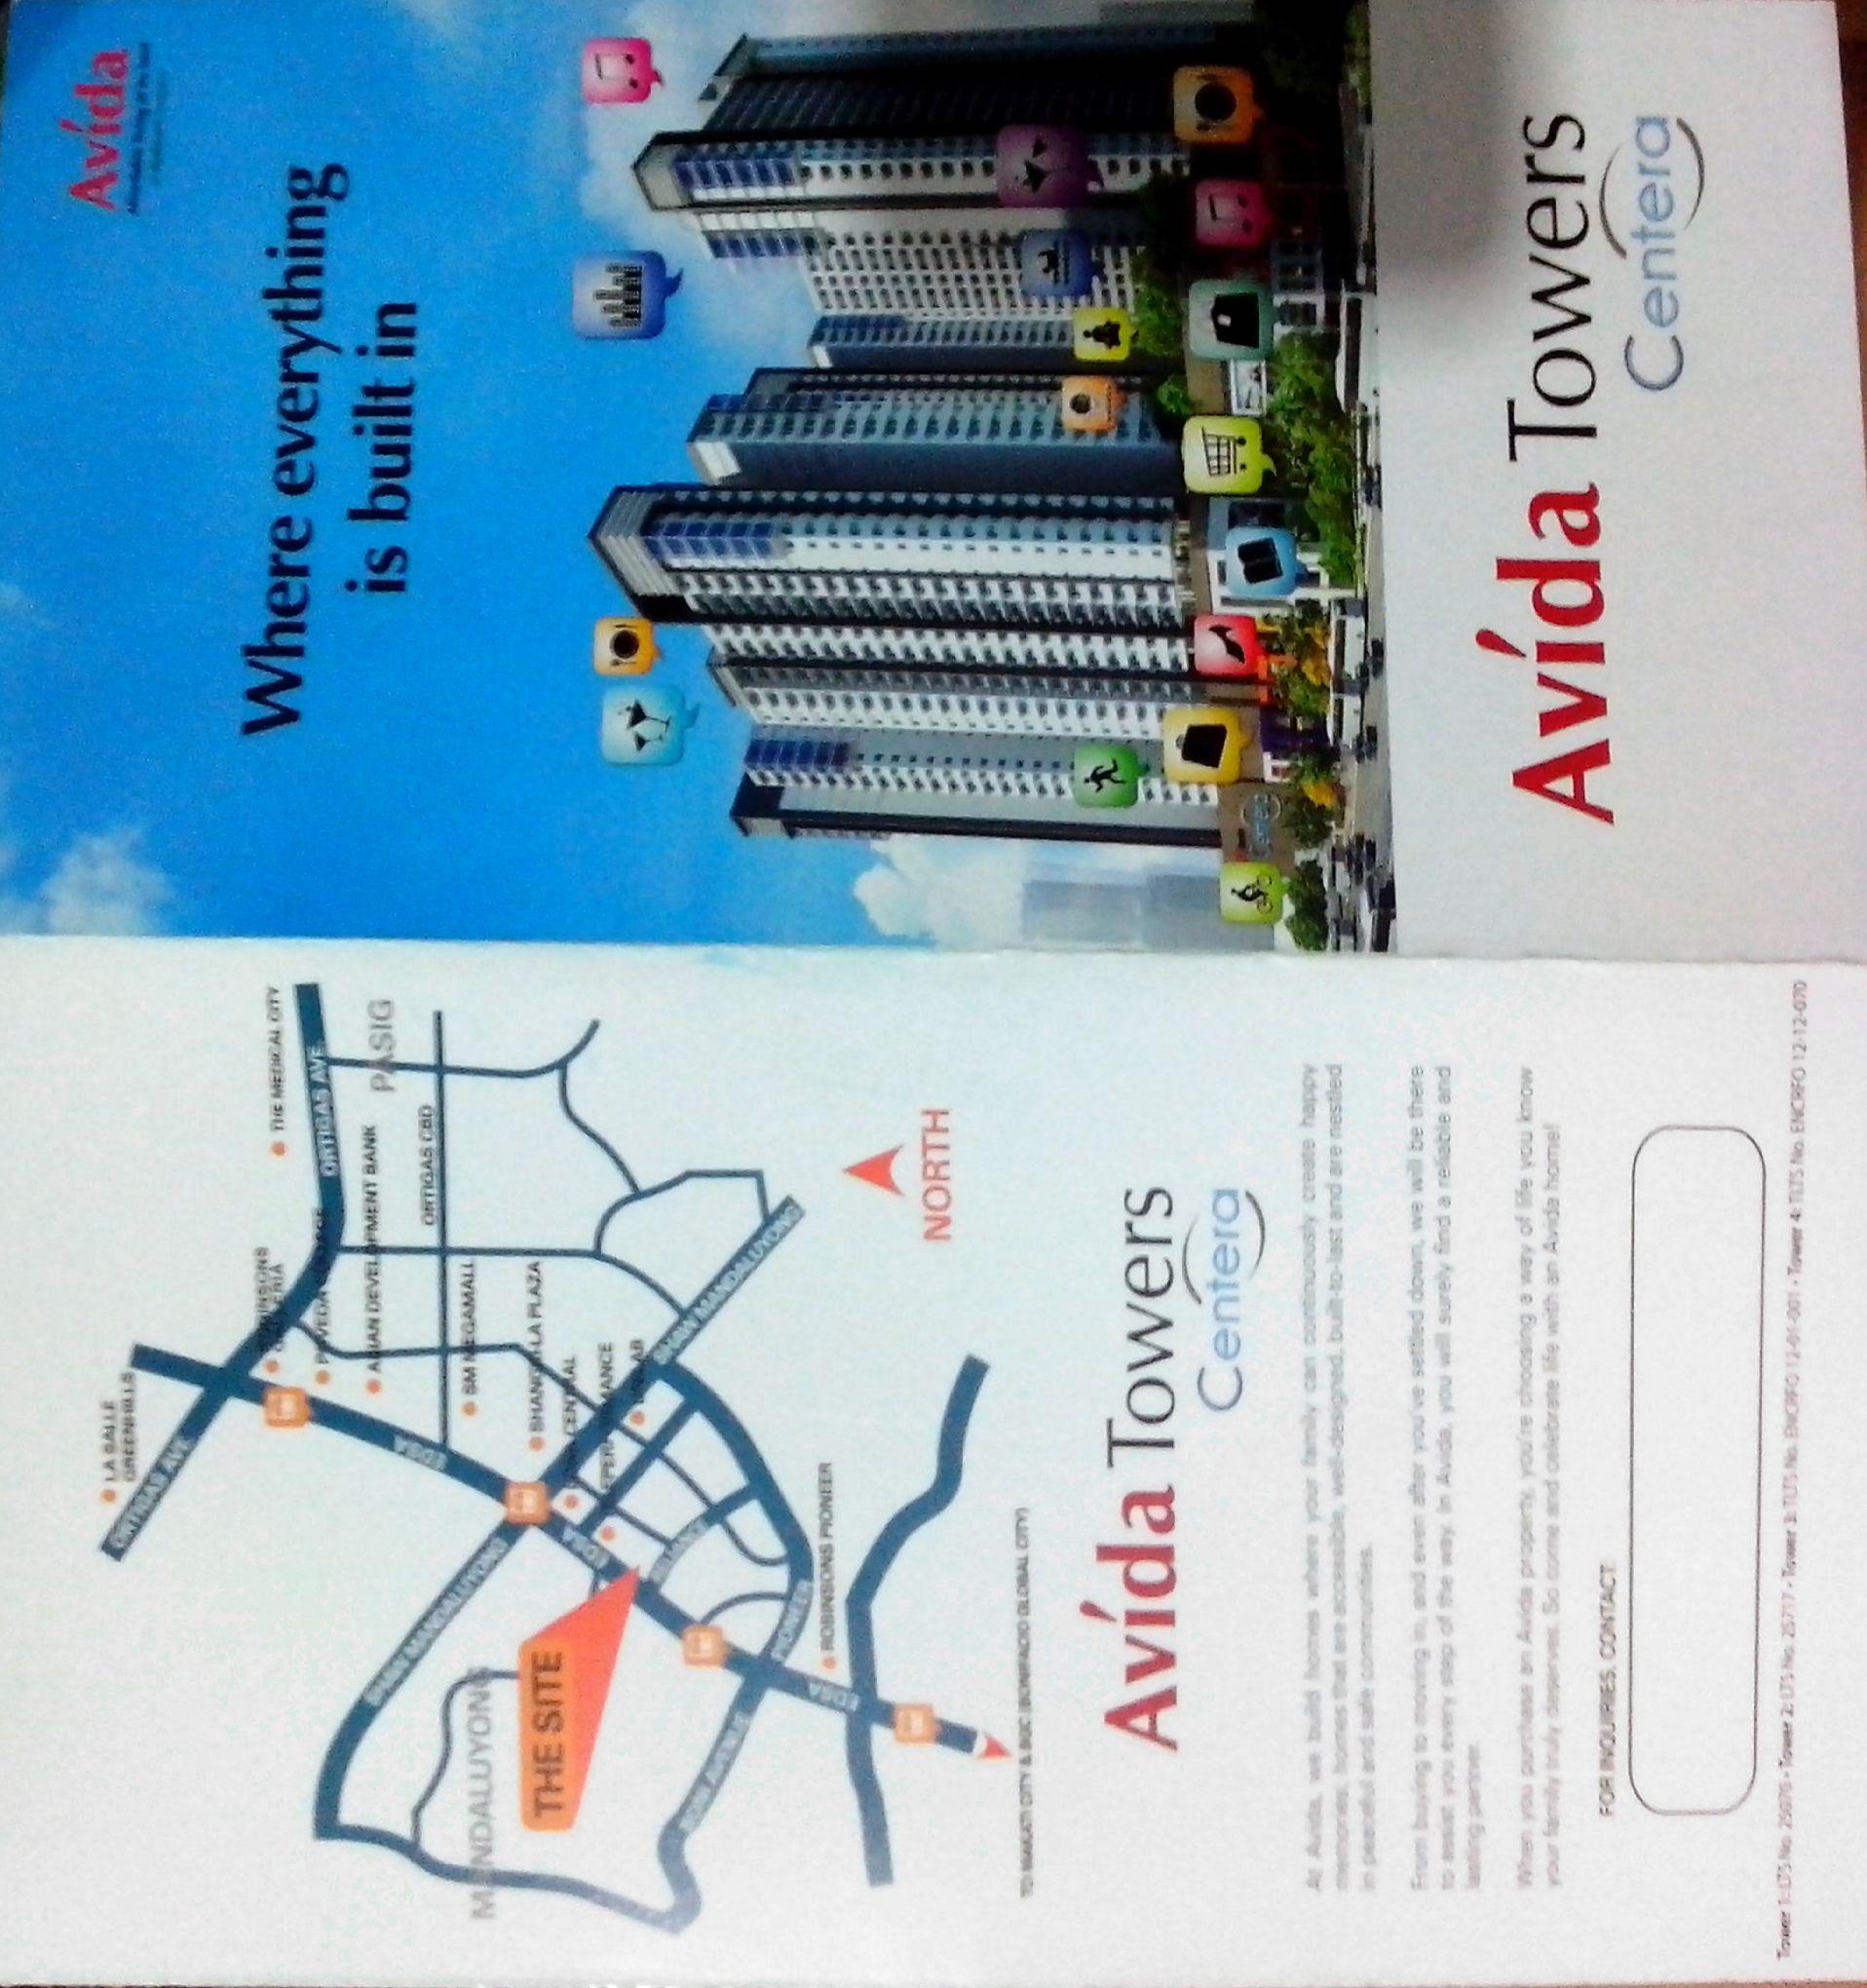 FOR SALE: Other Announcements Manila Metropolitan Area > Mandaluyong